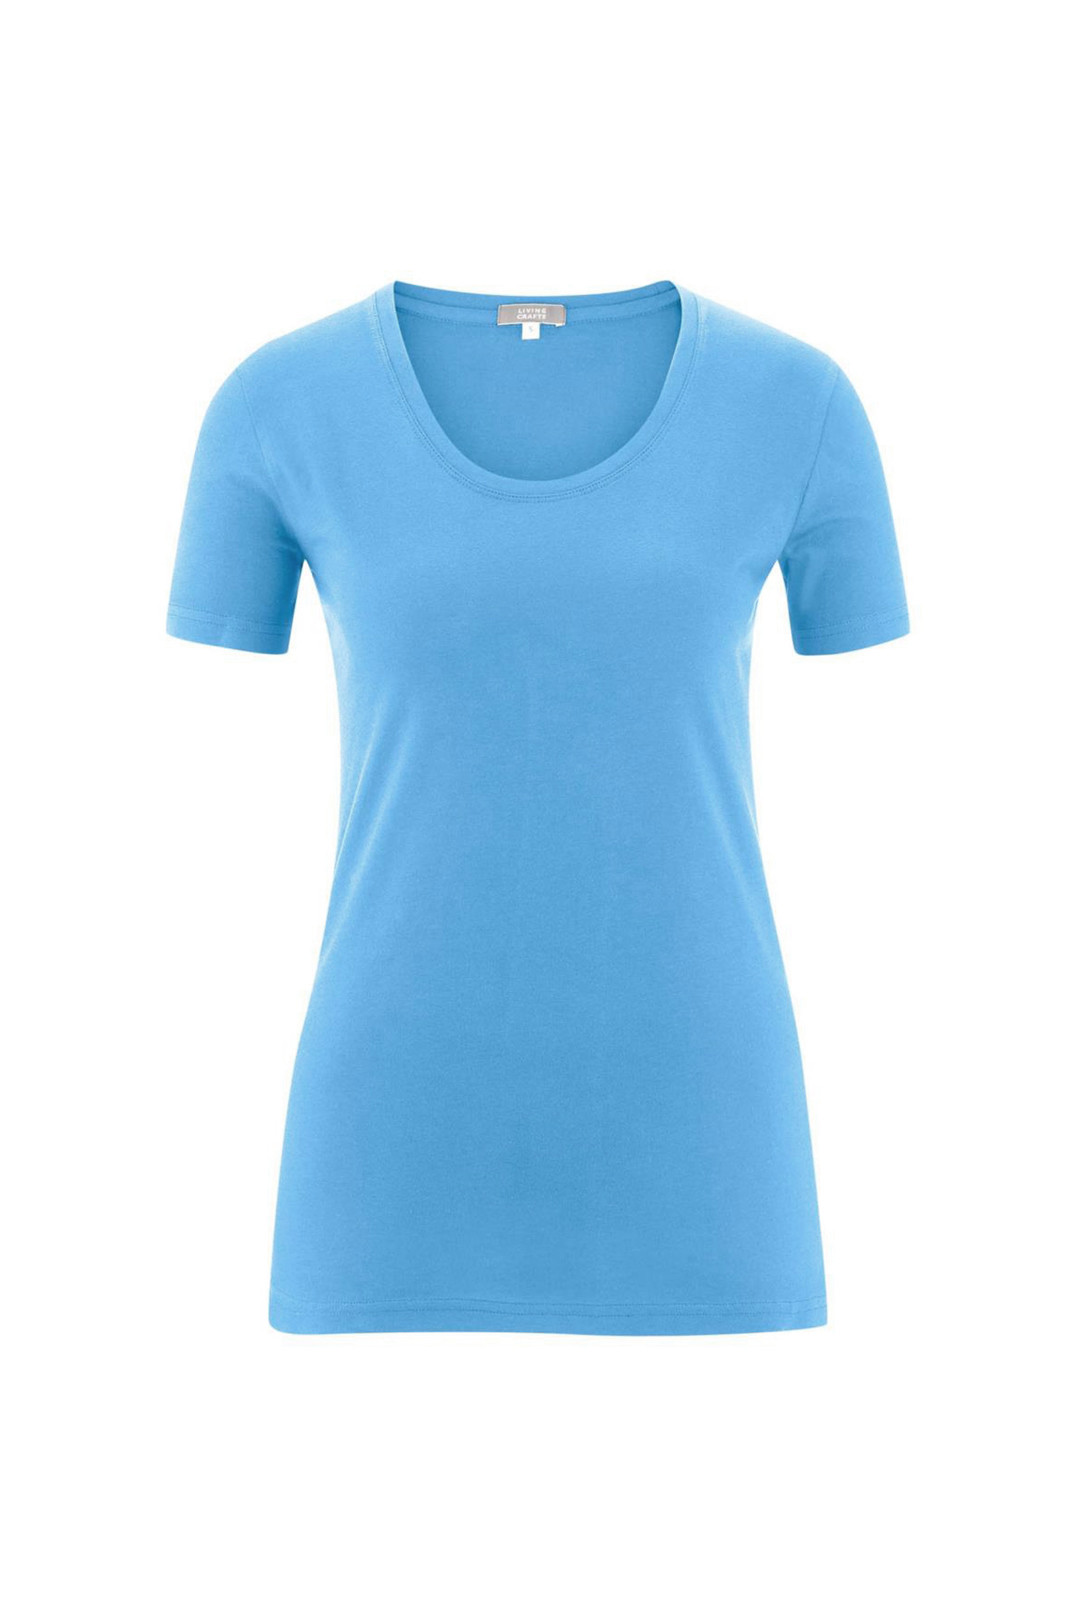 Glara Dámské tričko s krátkým rukávem z organické bavlny 551875